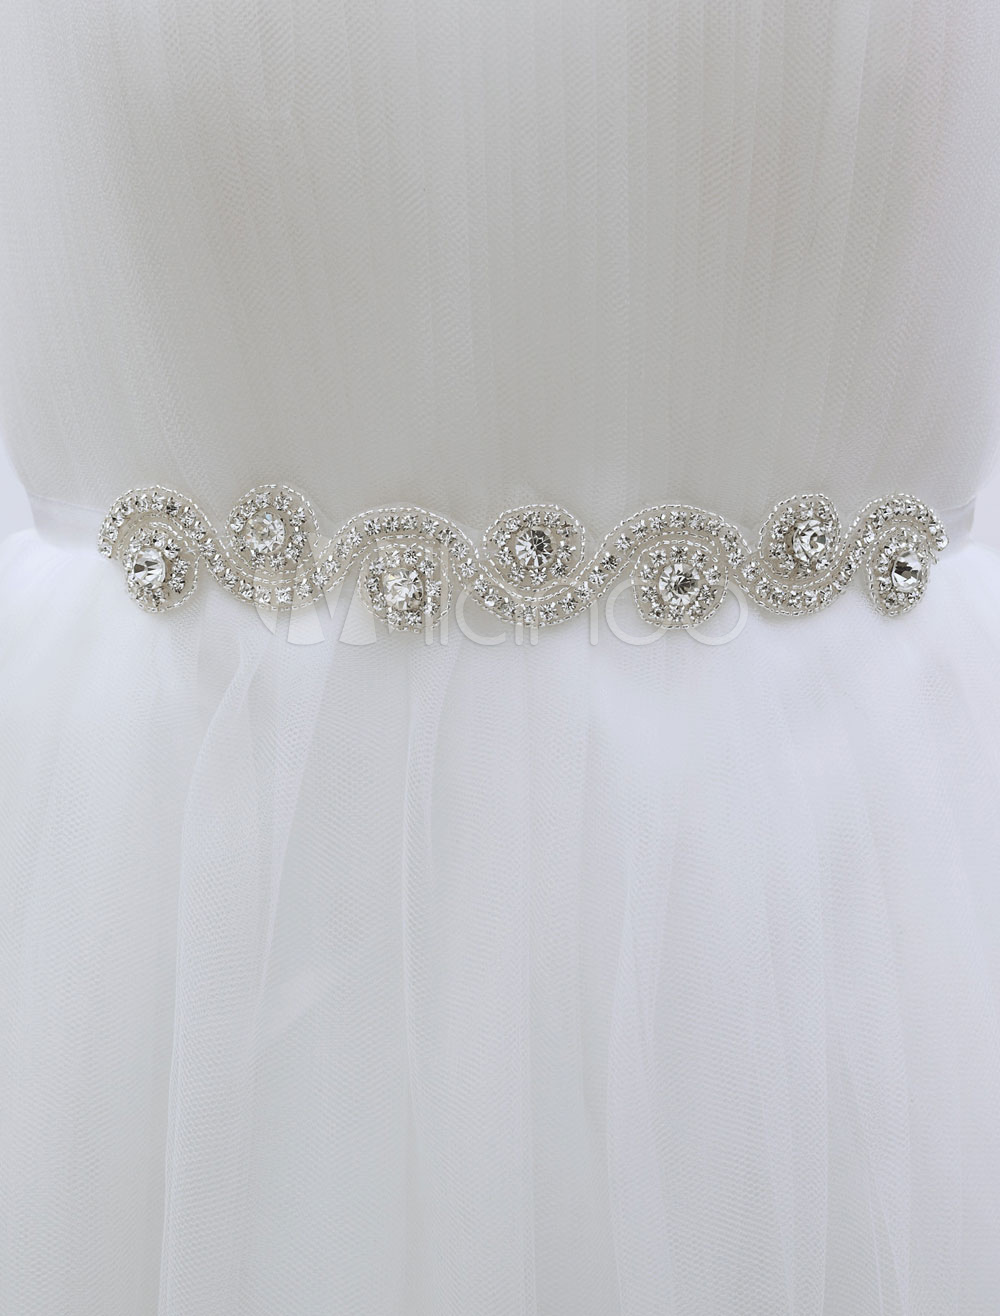 Buy White Wedding Sash Rhinestone Decoration S-Type Bridal Sash for $15.99 in Milanoo store